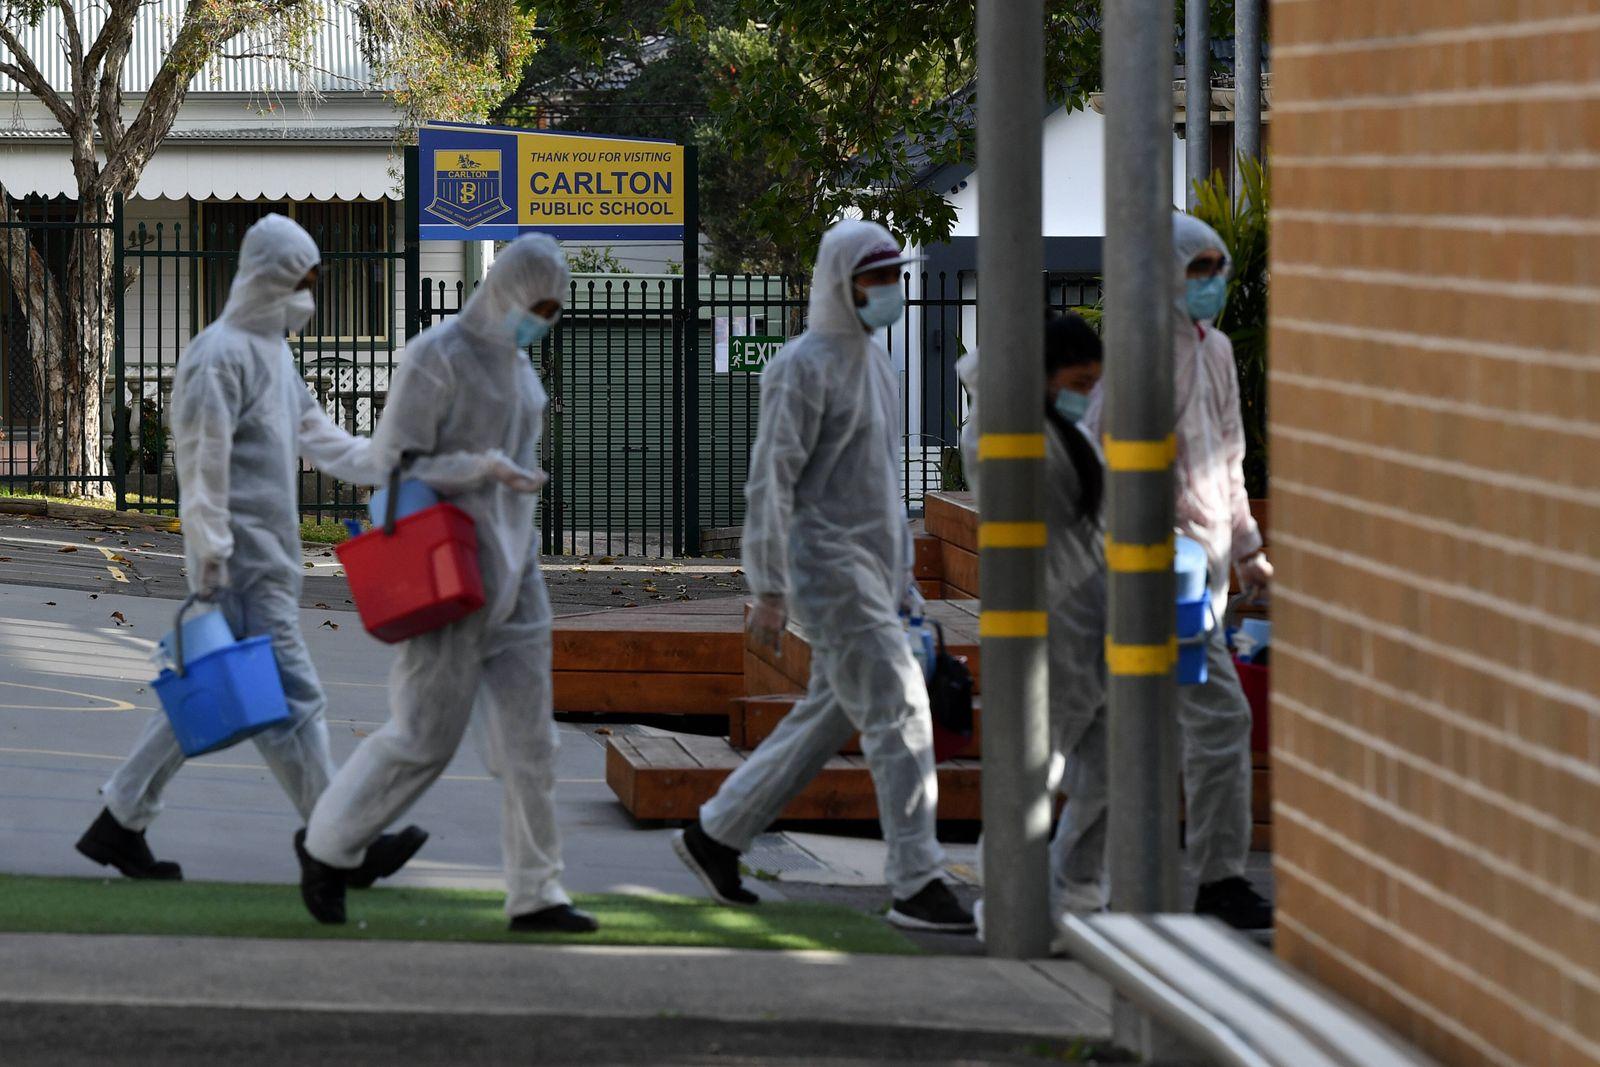 Coronavirus in Australien, Lockdown in Sydney NSW CORONAVIRUS COVID19, Workers conduct a deep clean at Carlton Public S